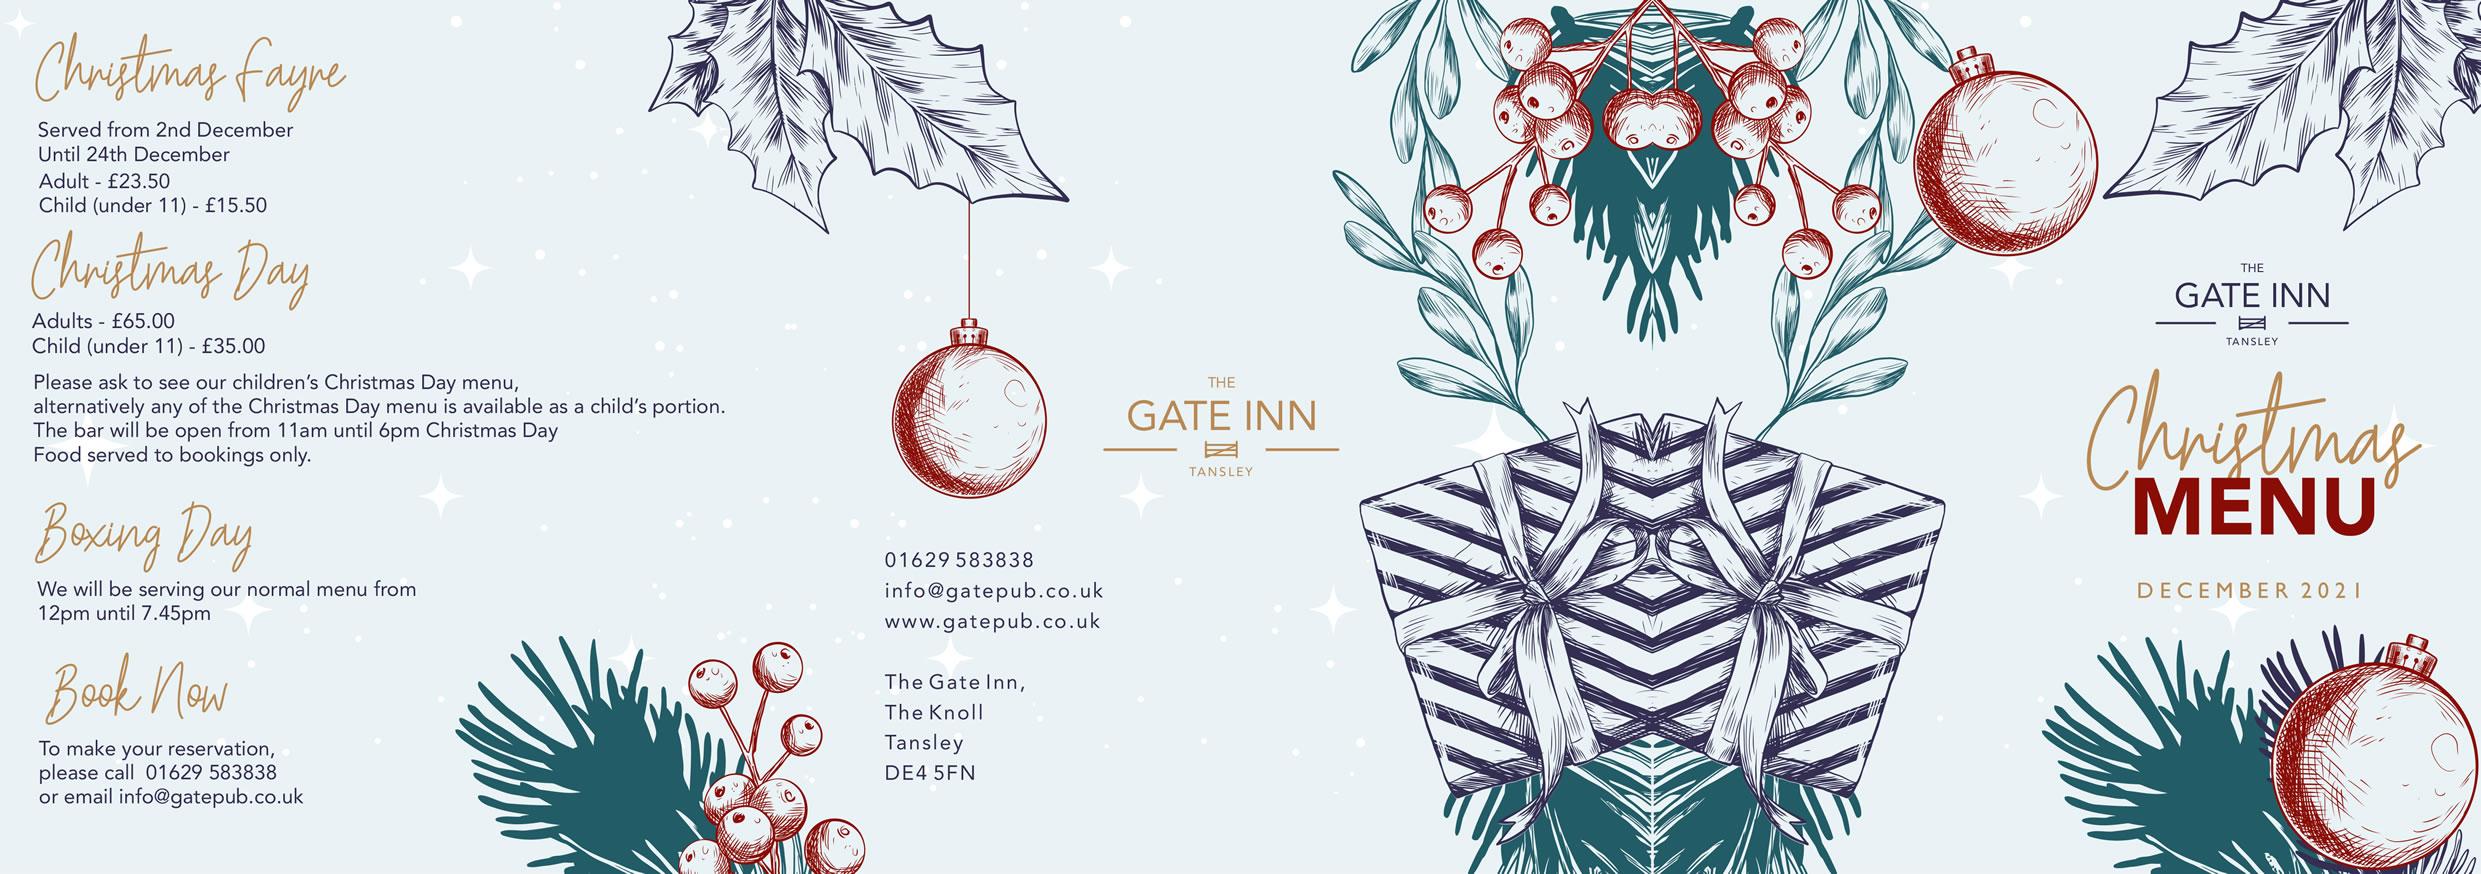 Gate Inn Tansley Christmas Menu 2021